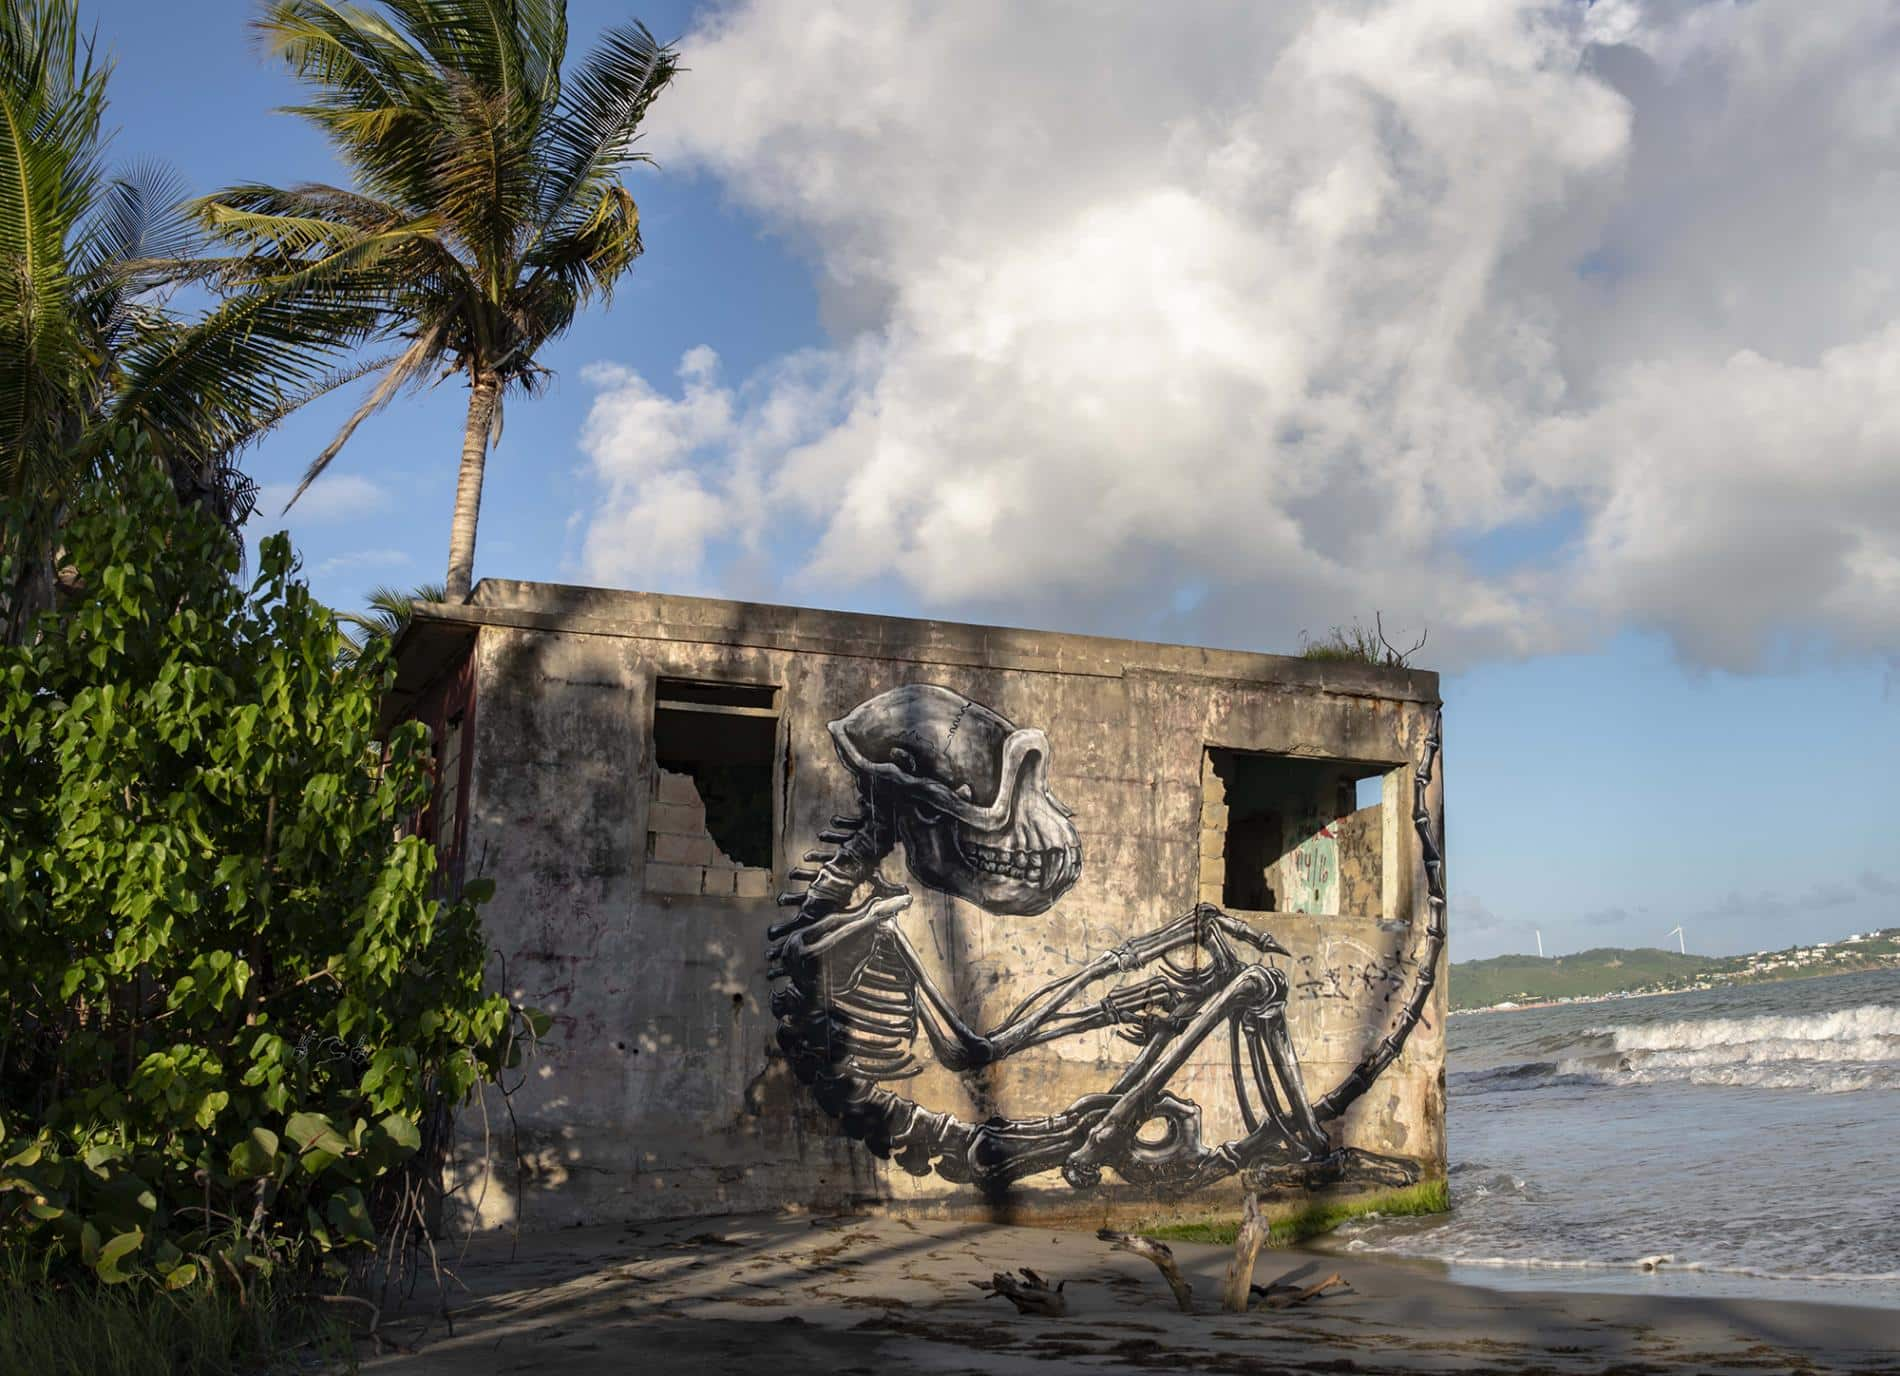 ROA PLAYAPUERTO RICO